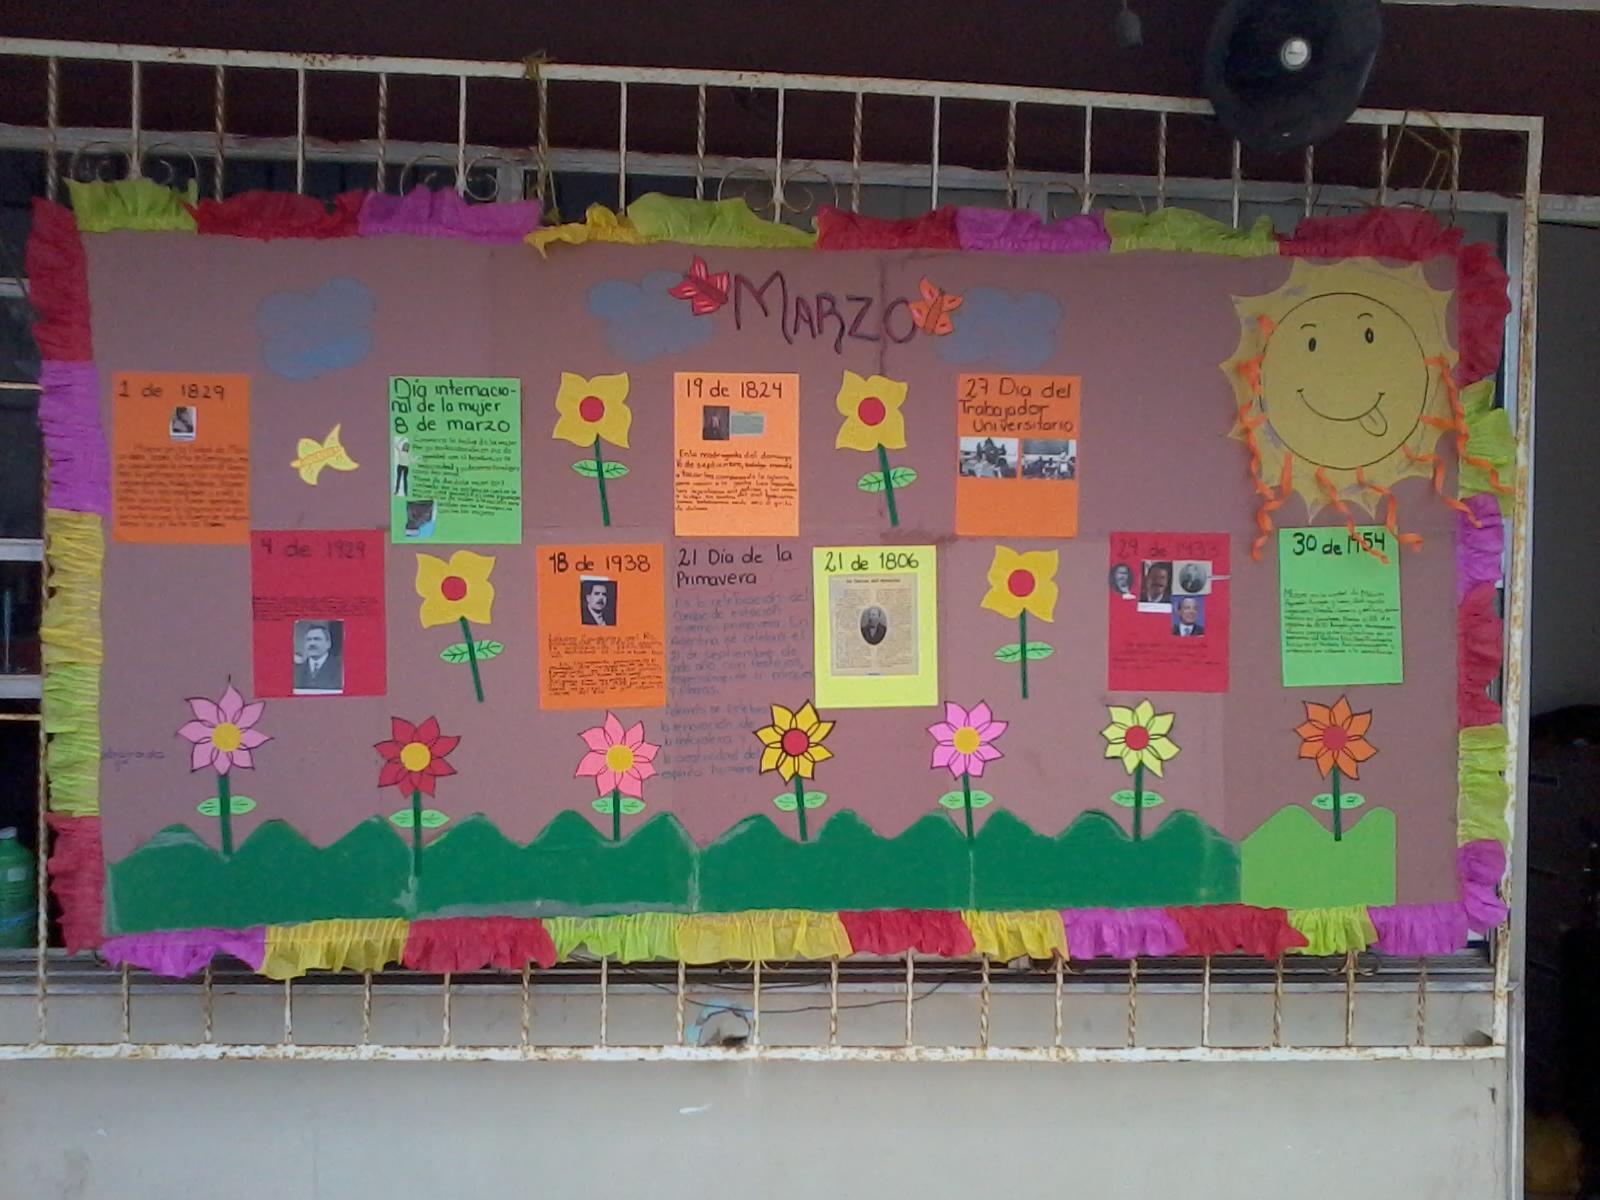 Periodico mural 4 imagenes educativas for Como elaborar un periodico mural escolar